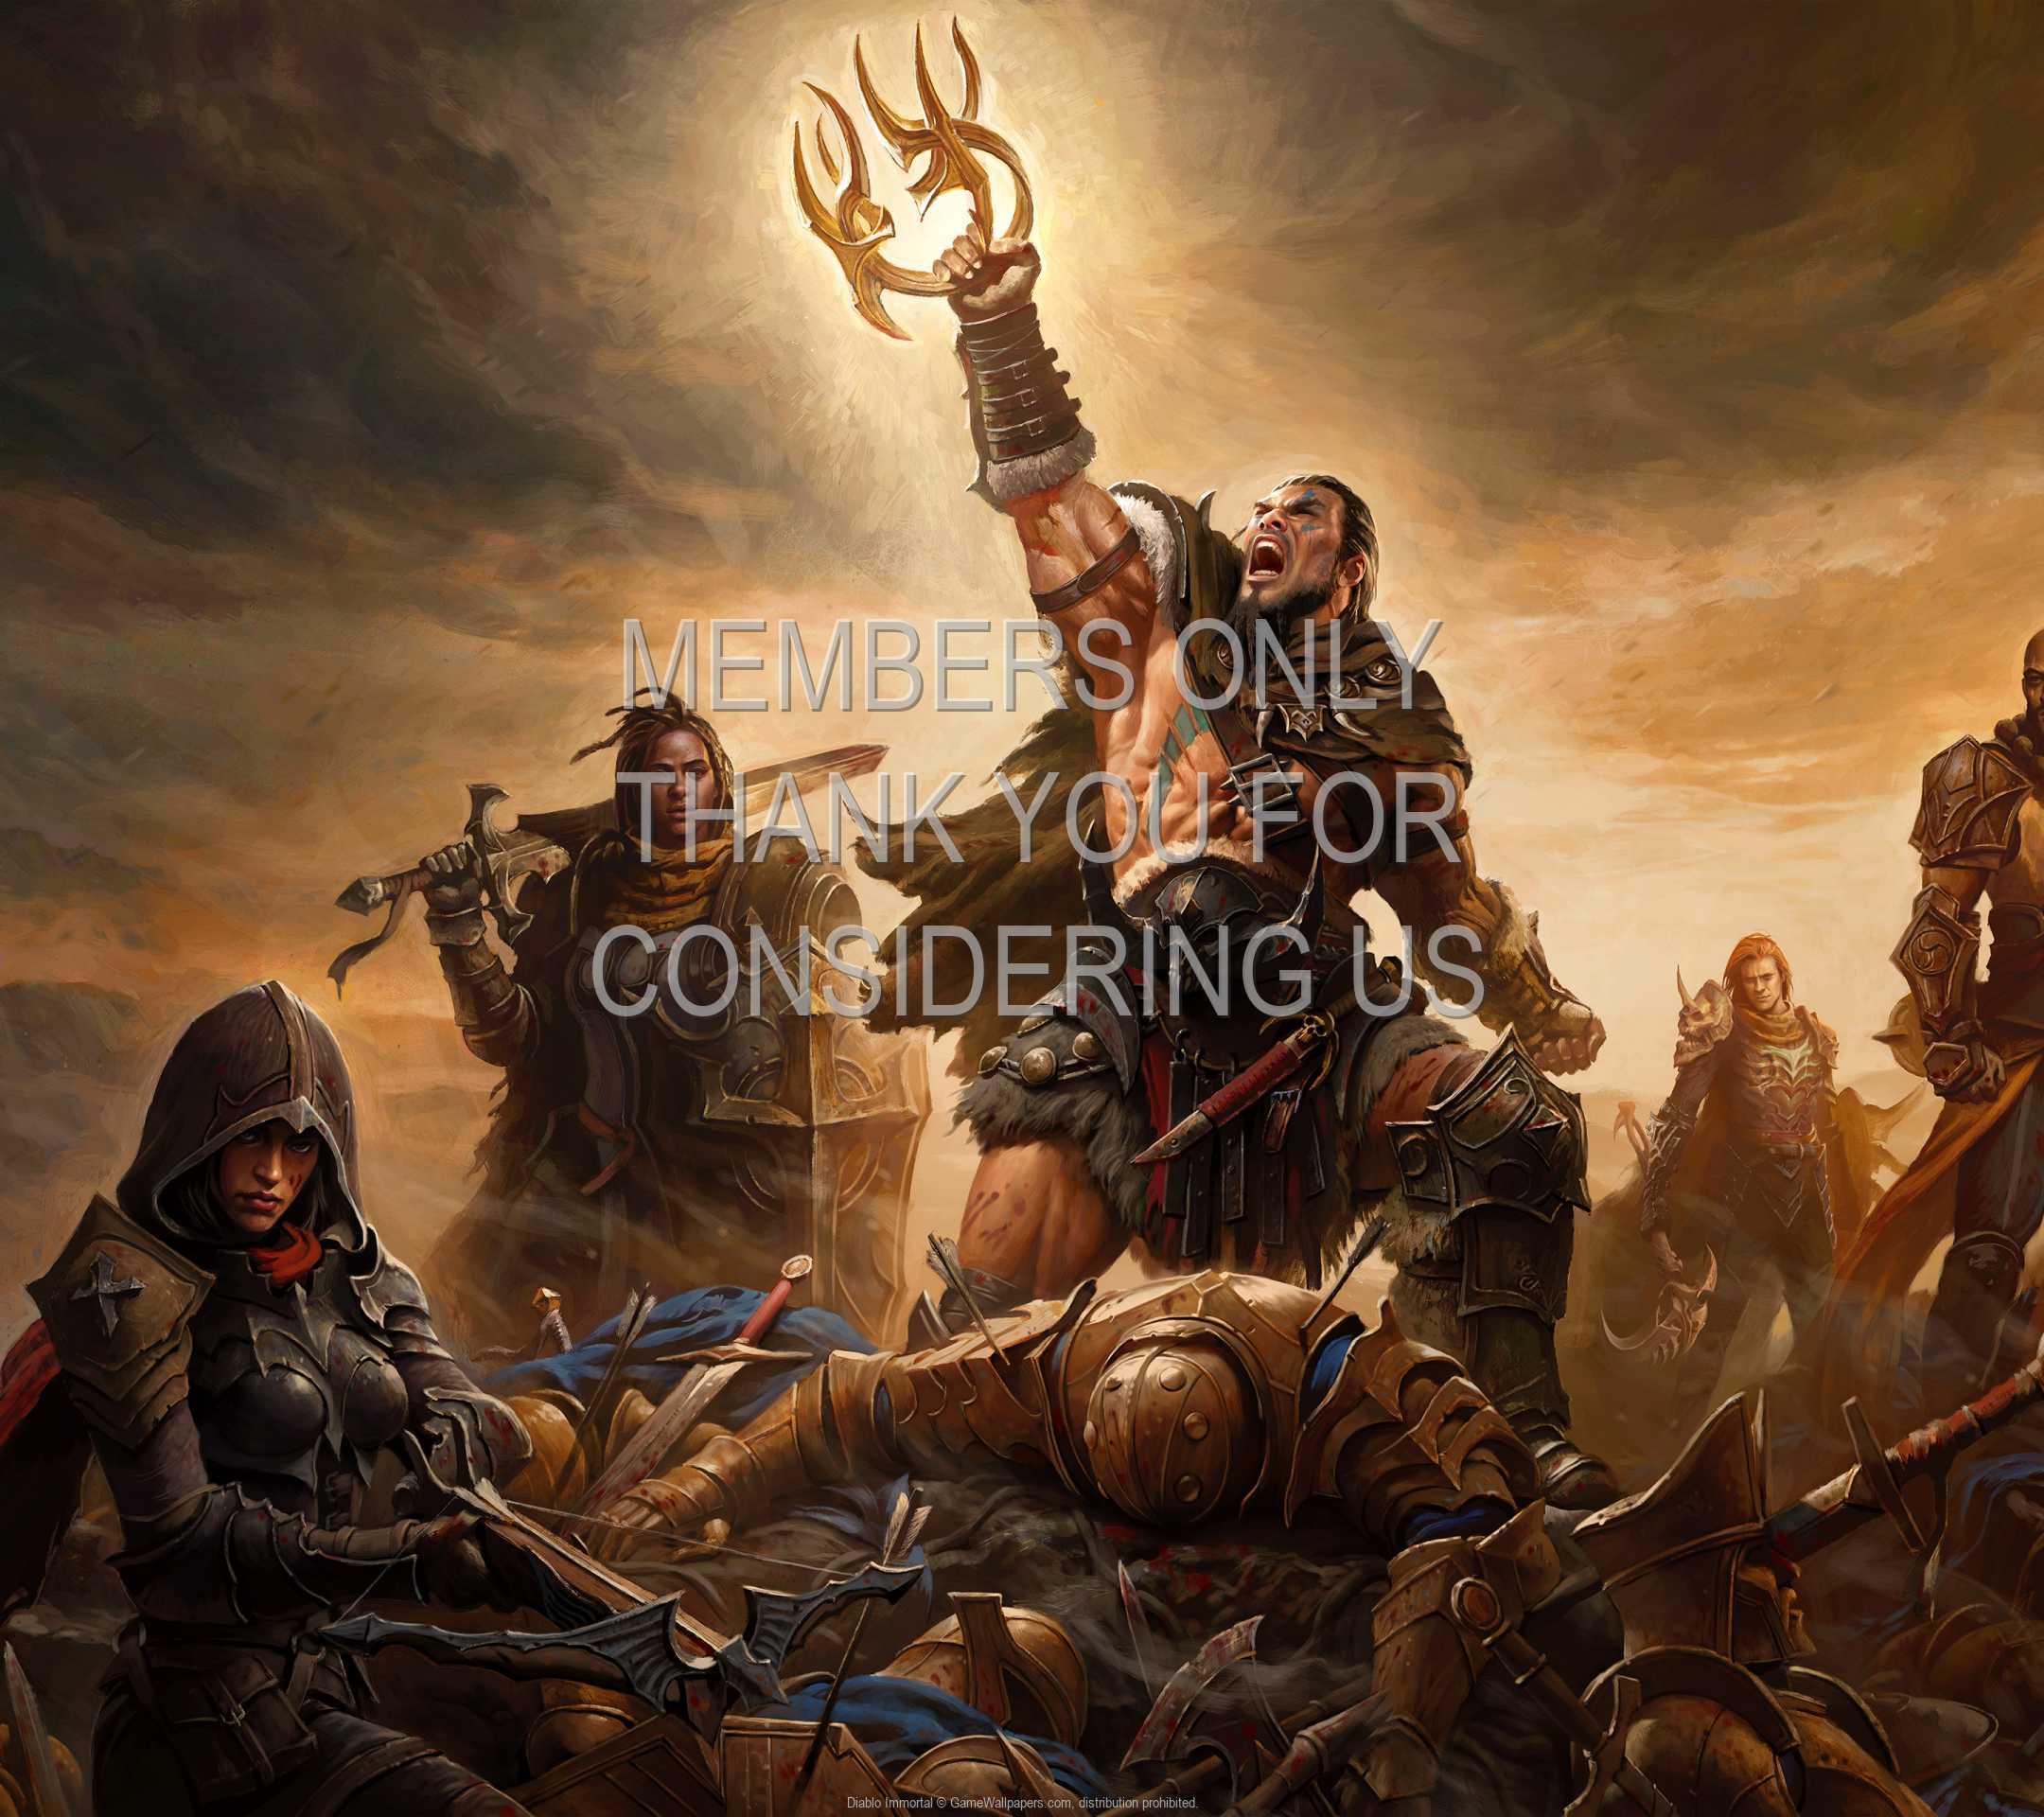 Diablo Immortal 1080p Horizontal Mobile wallpaper or background 12